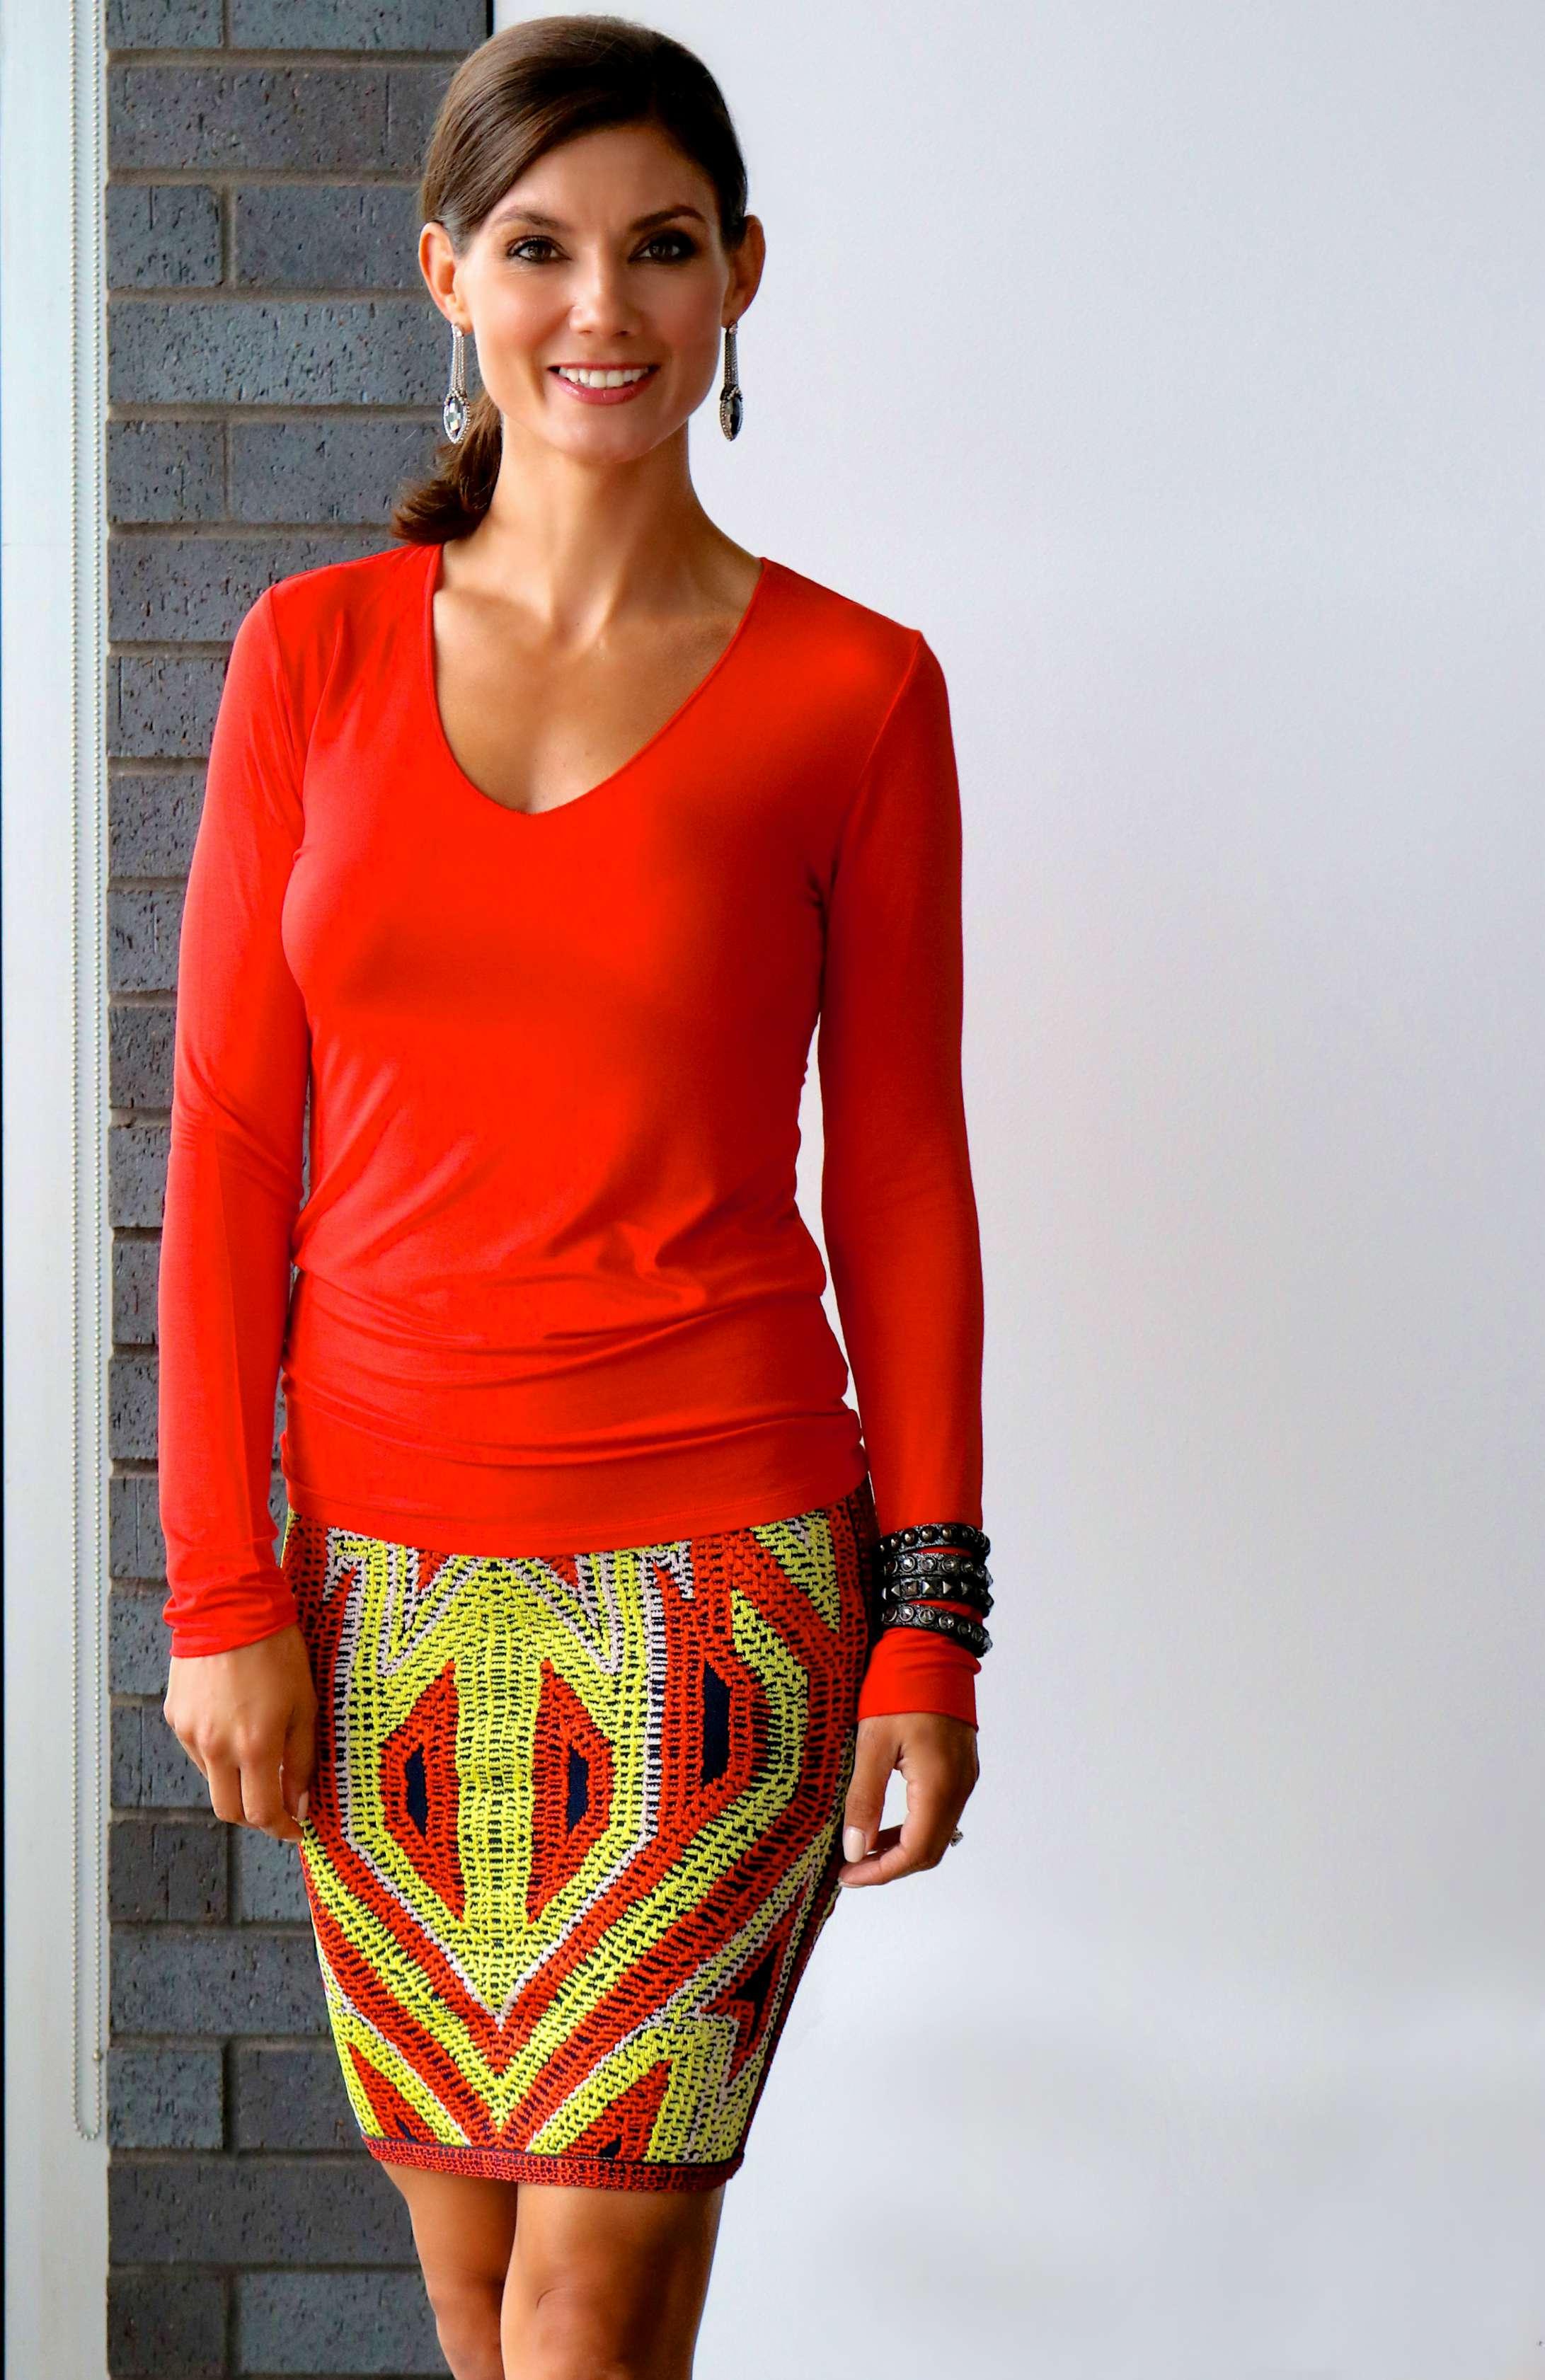 Majestic Filatures V Neck Long Sleeve Top , Herve Leger Ola Jacquard Skirt ,  Chain Drop Earrings